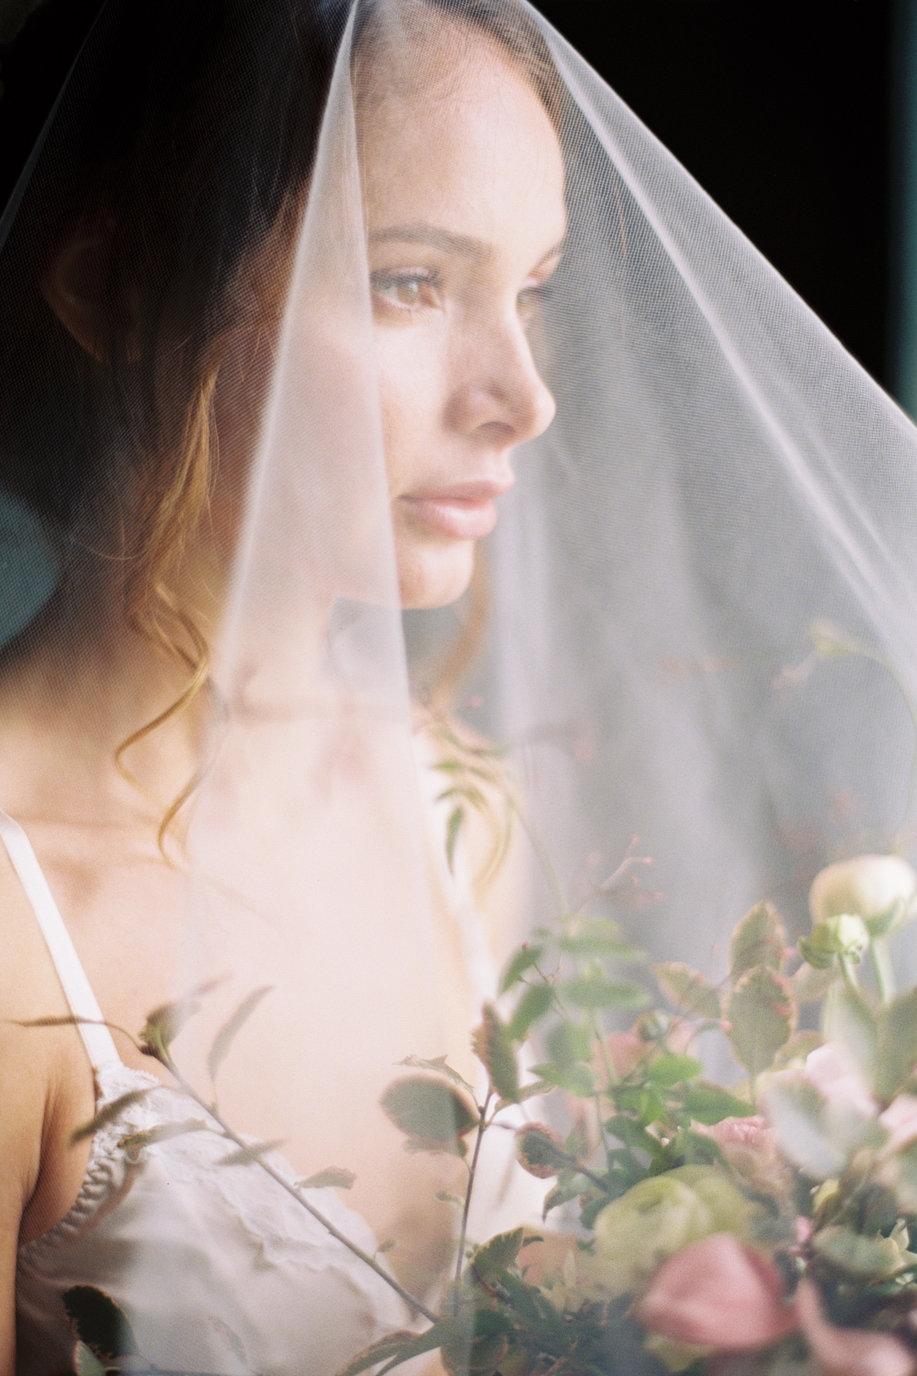 Launcells Barton Elopement shot for Wedding Sparrow